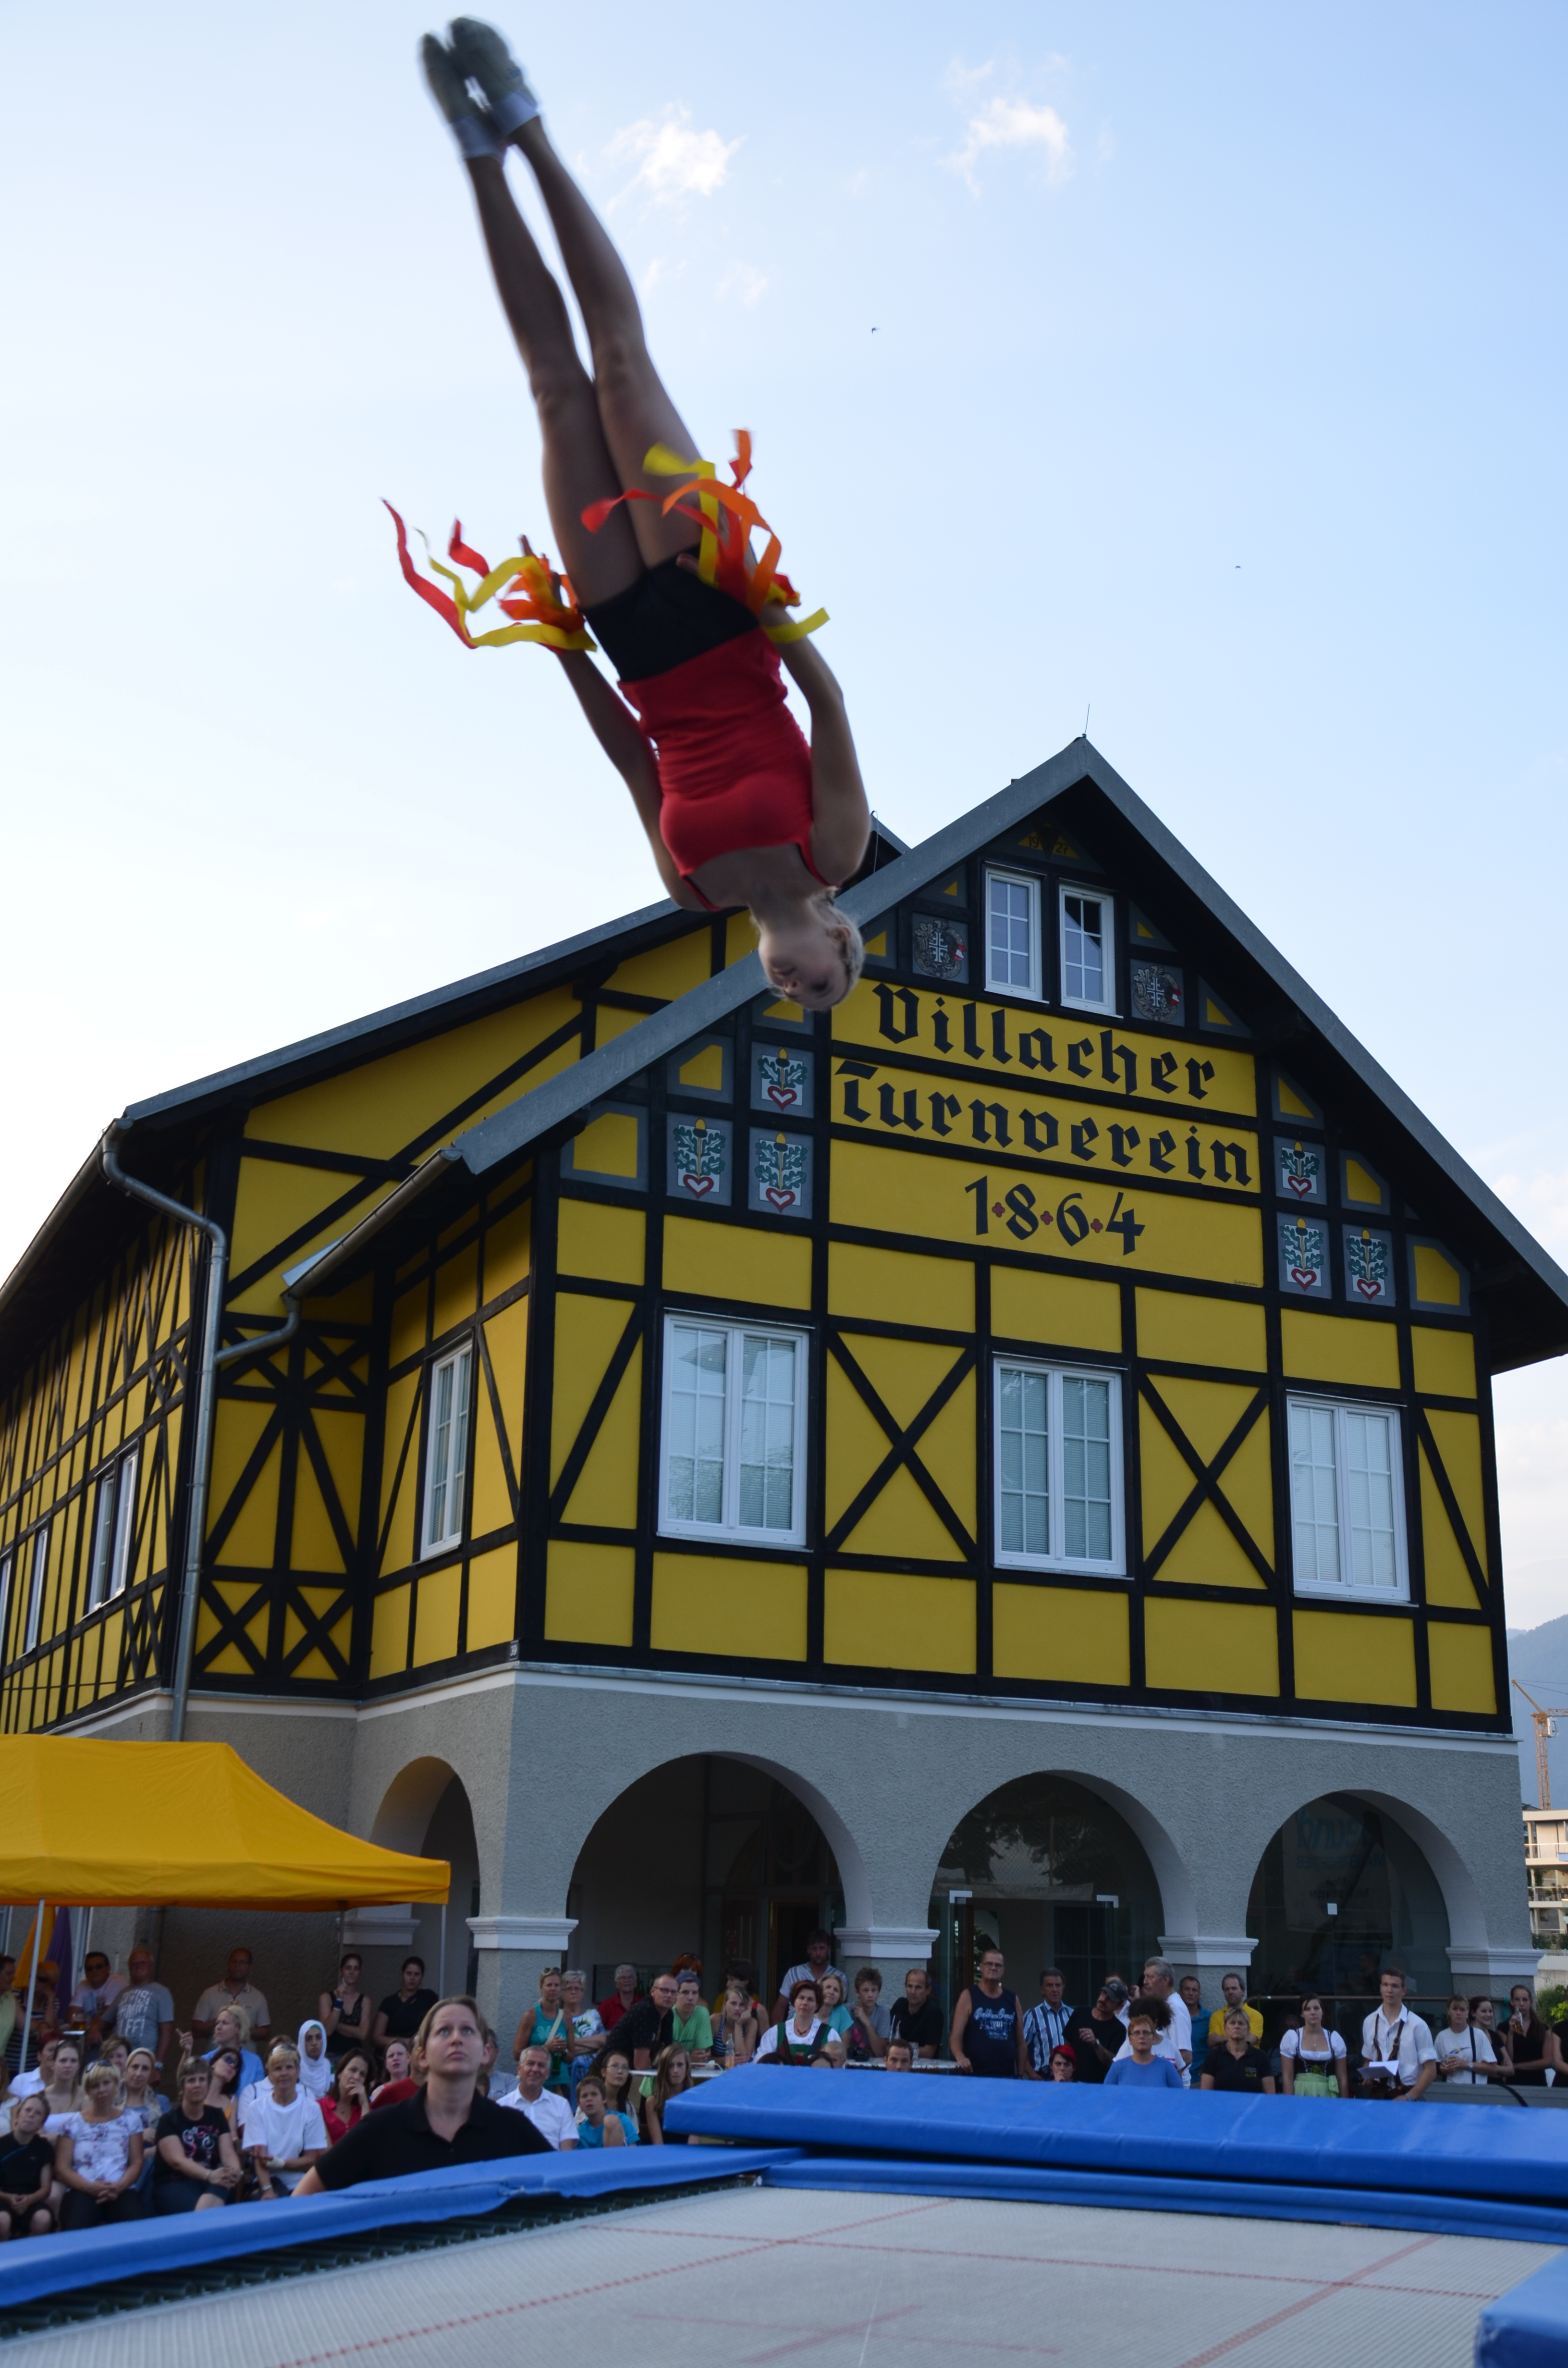 http://www.turnverein-villach.at/wp-content/uploads/2017/01/DSC_0221.jpg